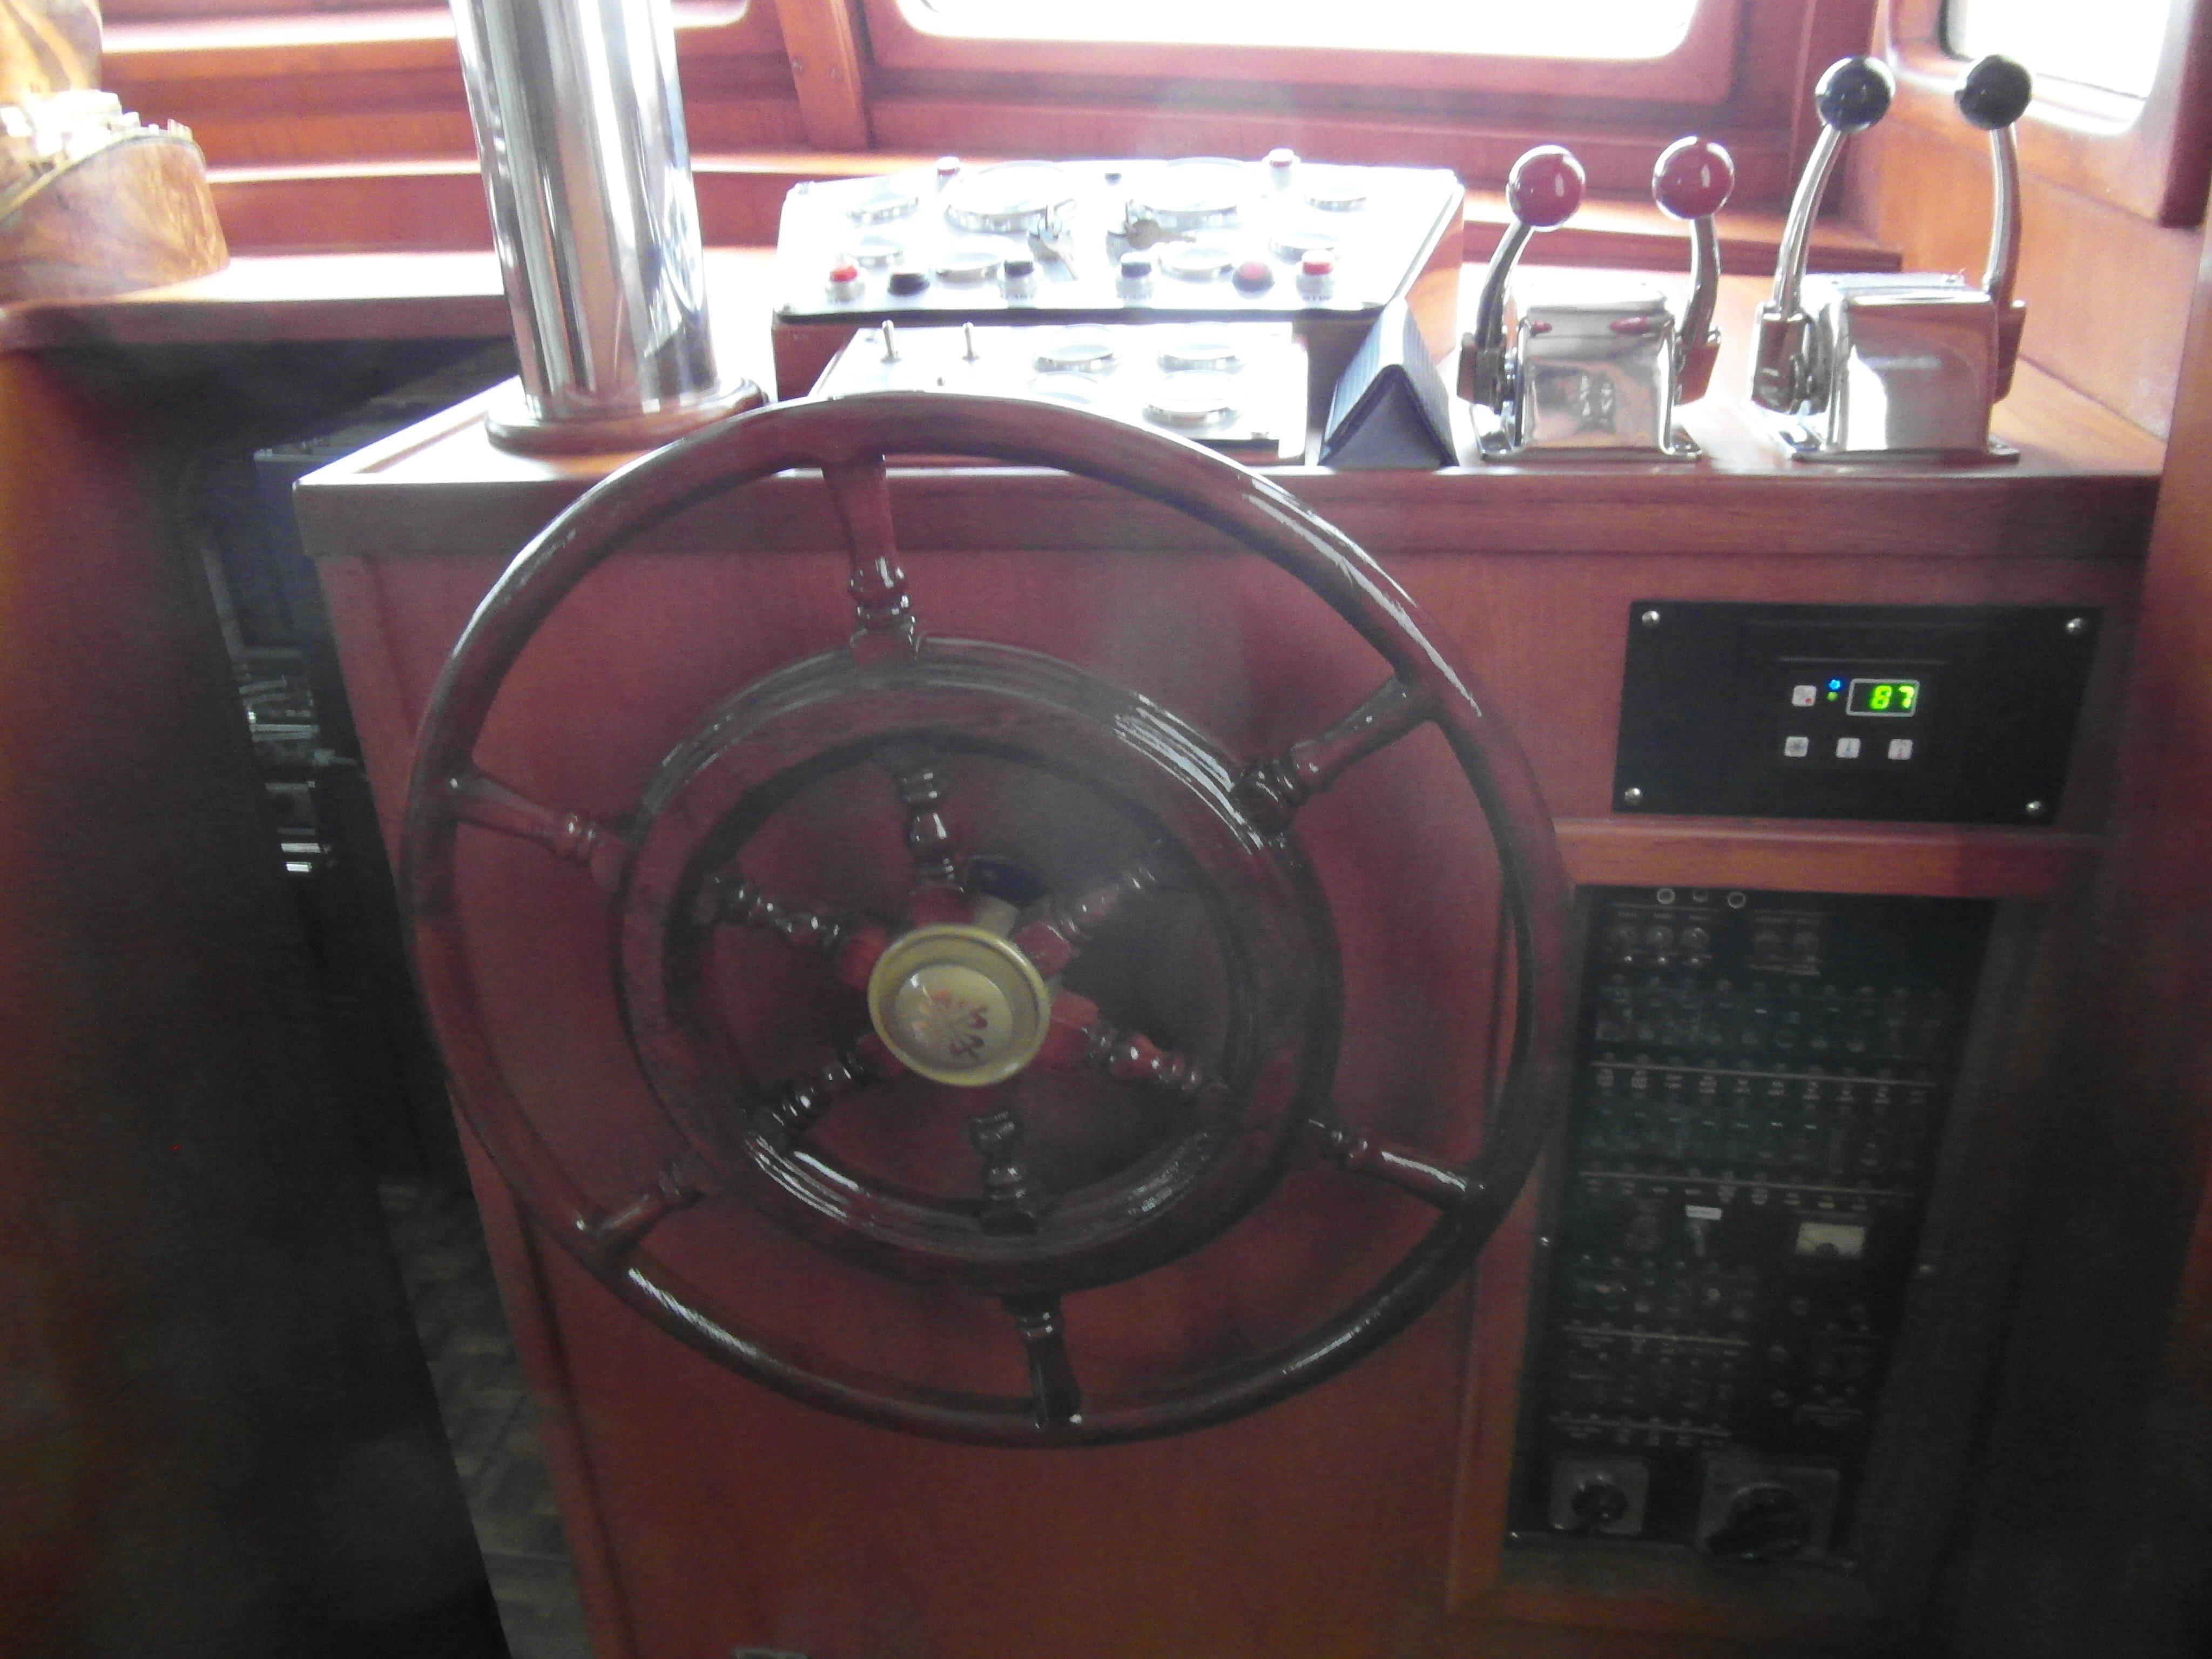 New Controls / New Gauges / New Electronics / Refinished Wheel